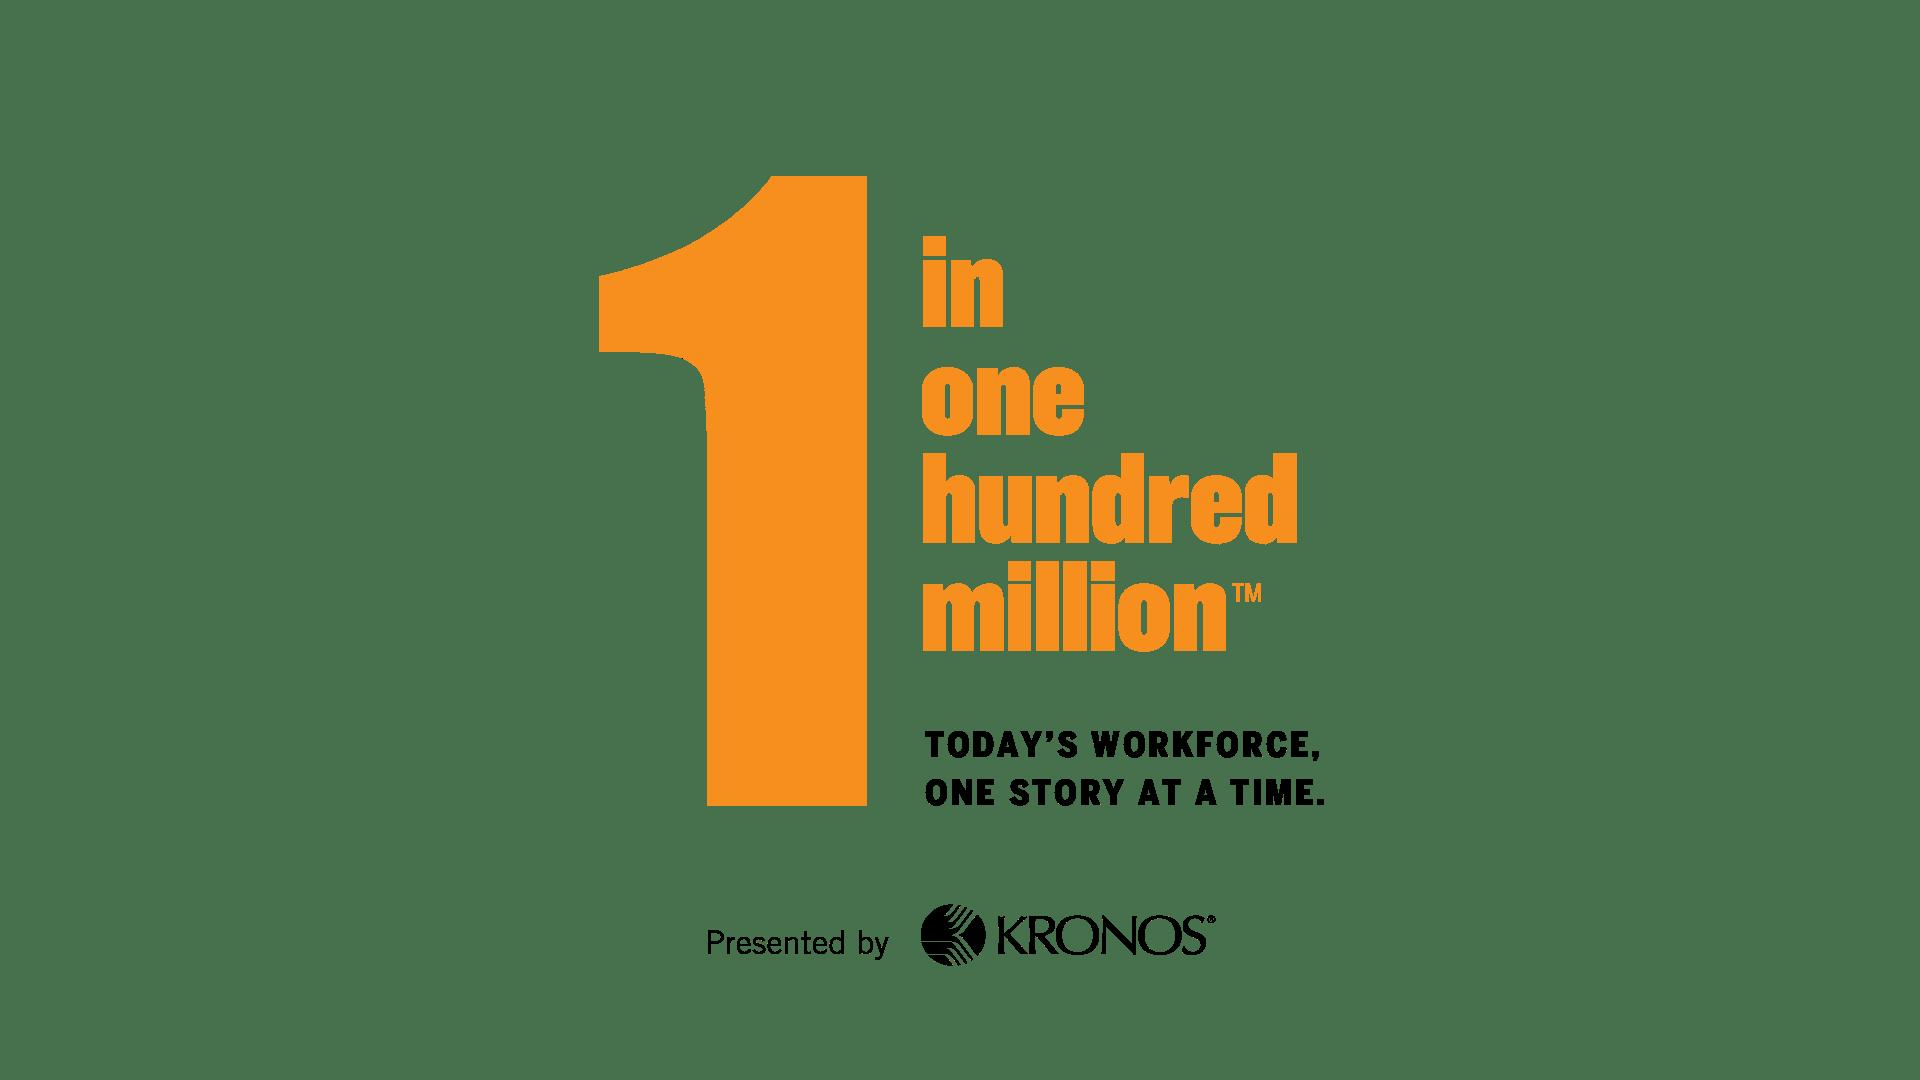 1 in 100 million - celebrating today's workforce